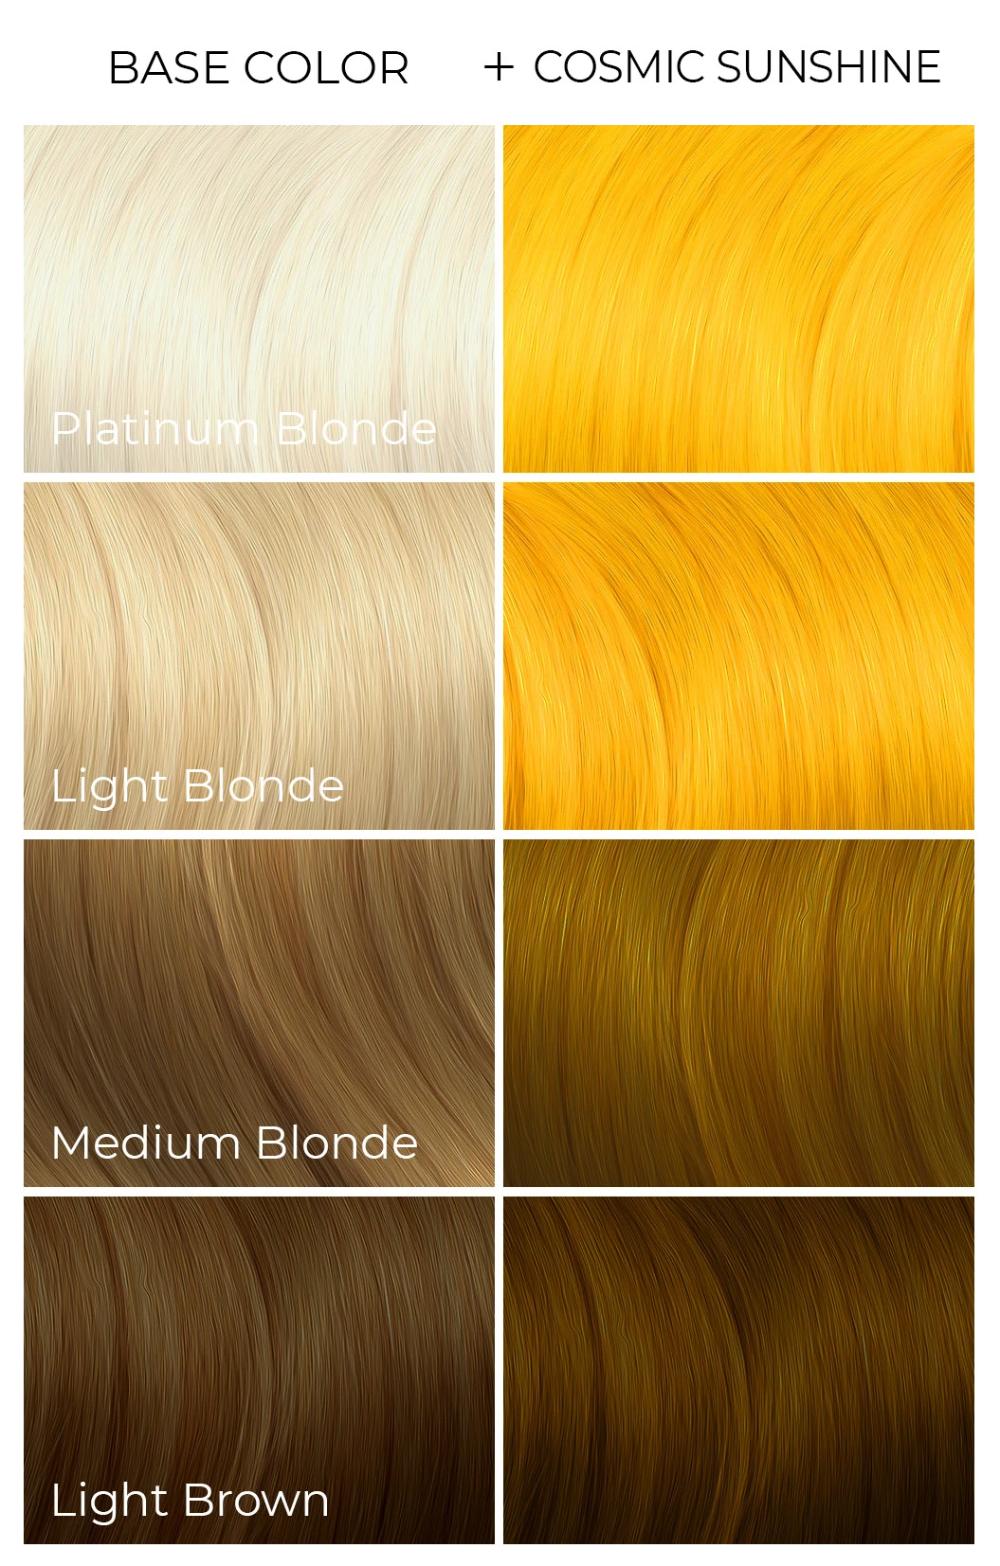 Cosmic Sunshine In 2021 Hair Color Esalon Hair Color Fox Hair Dye